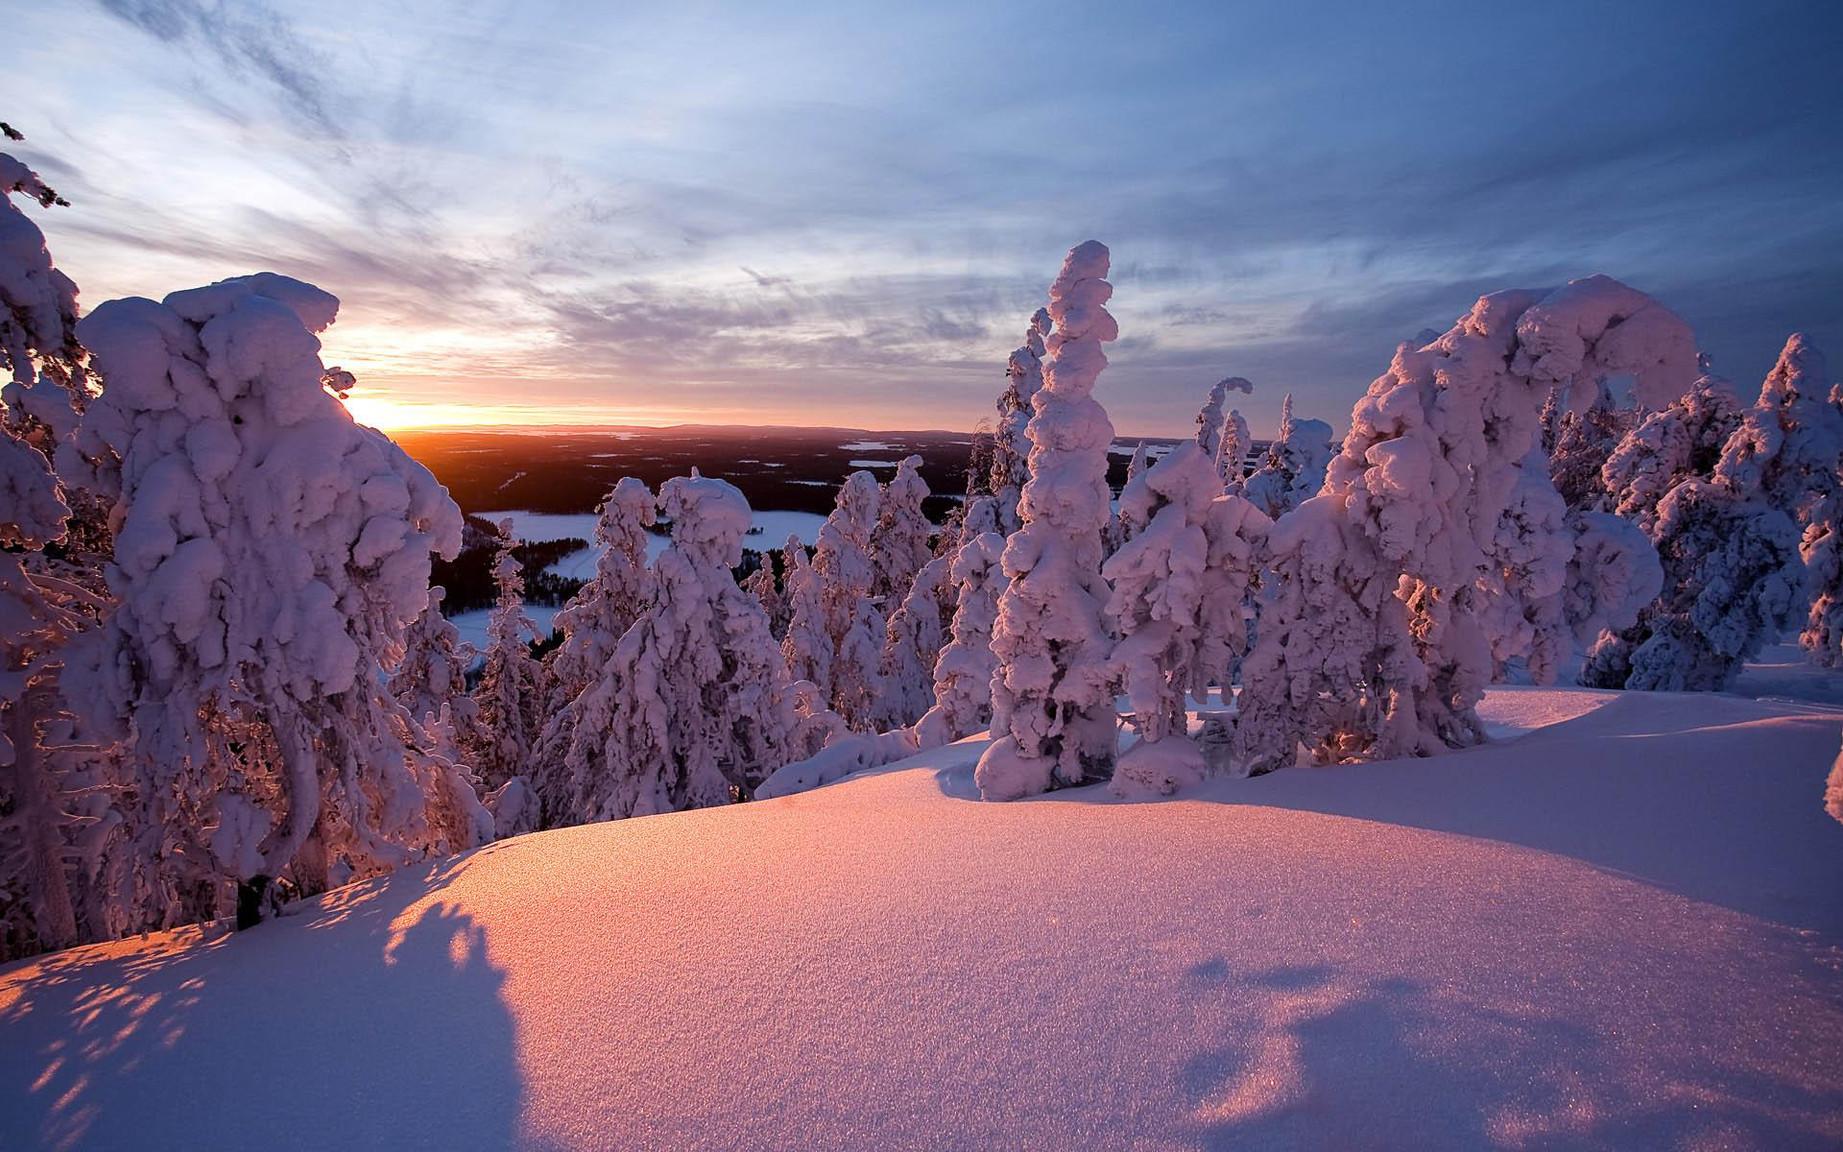 ws_Winter_Sky_1920x1200.jpg